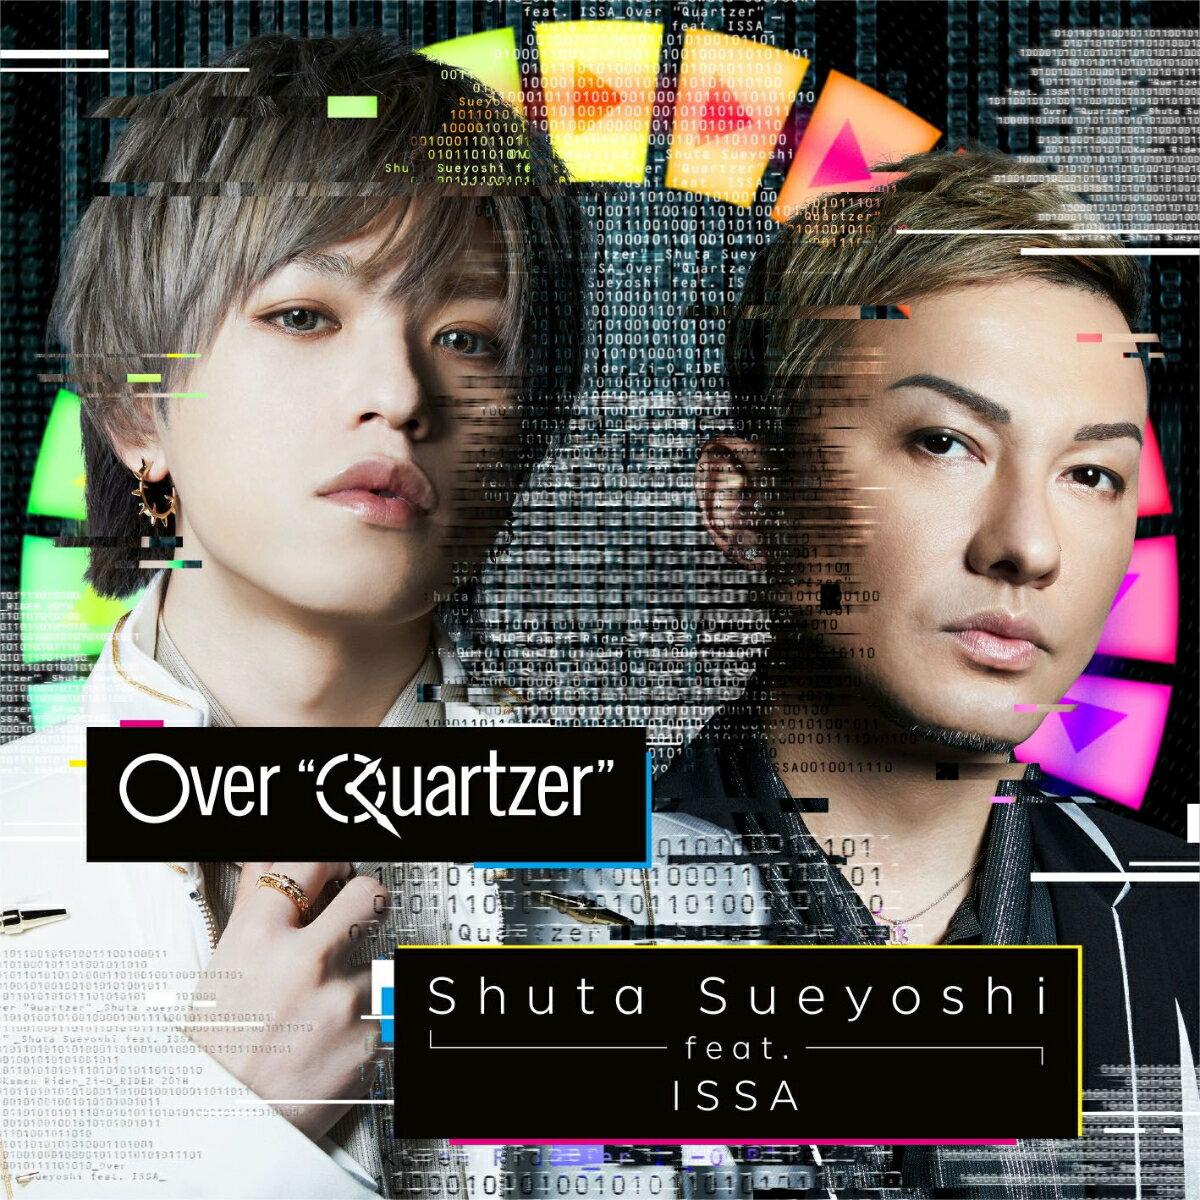 "Over ""Quartzer"" (CD+DVD) [ Shuta Sueyoshi feat.ISSA ]"